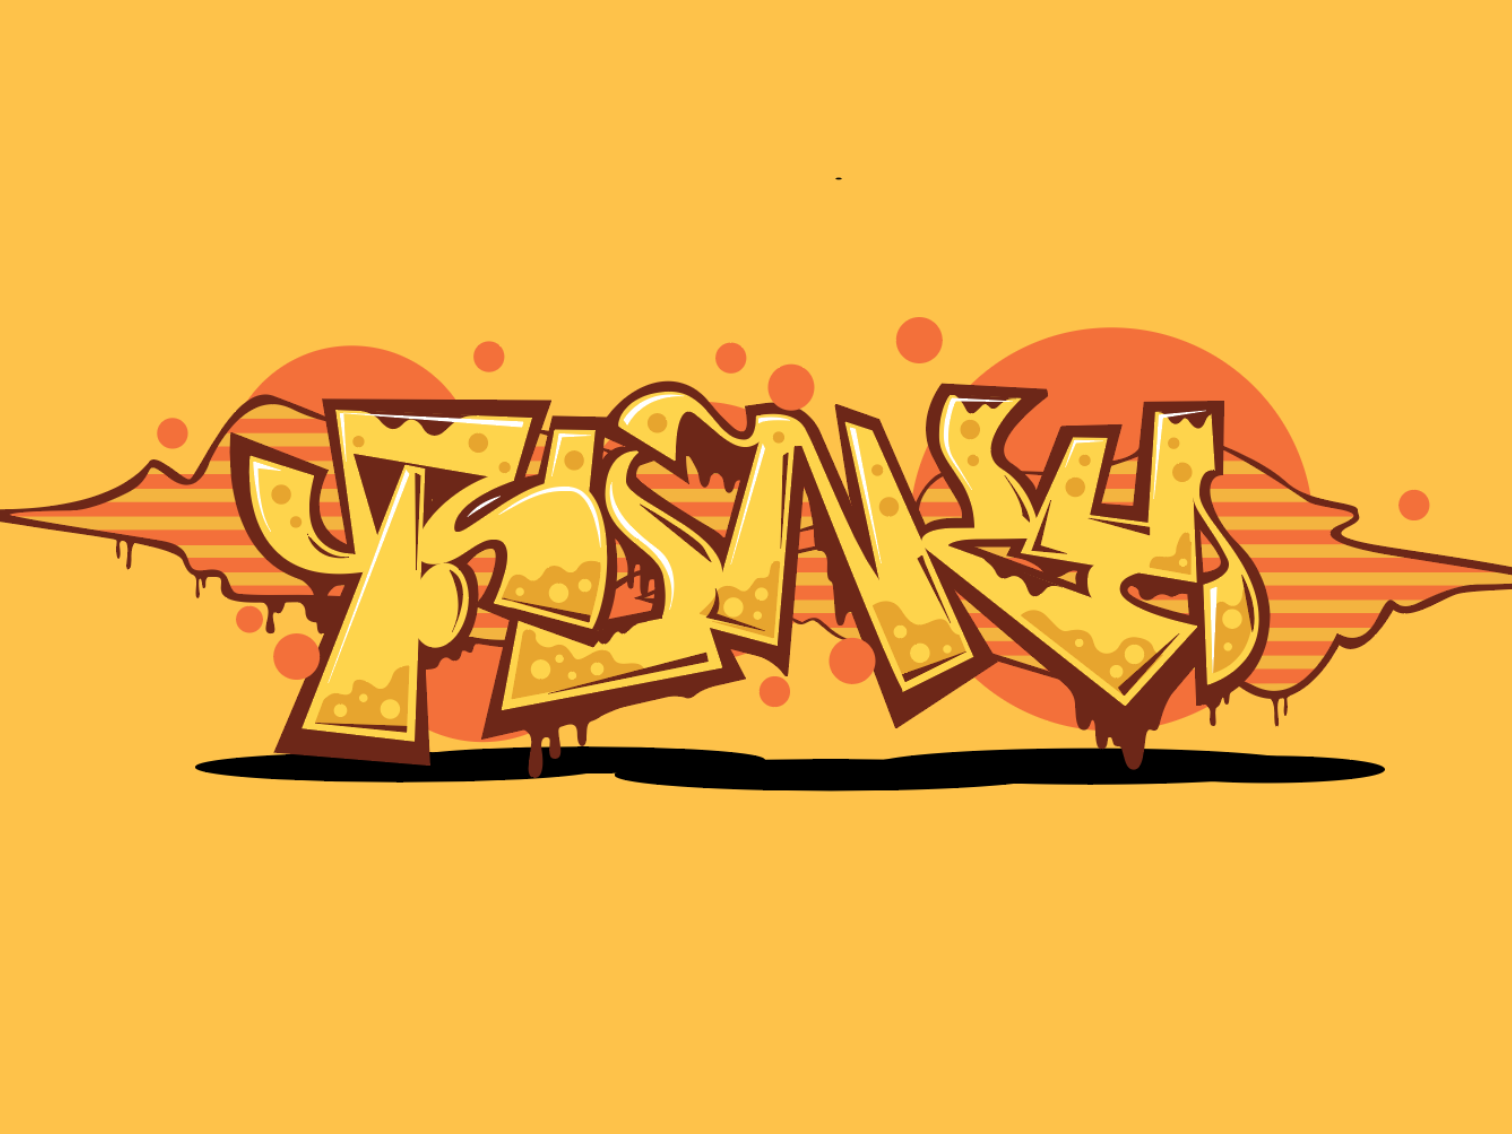 Digital Graffiti art graphic design lettering visual design digital graffiti illustrator adobe illustrator adobe vectors digital art graffiti art graffiti